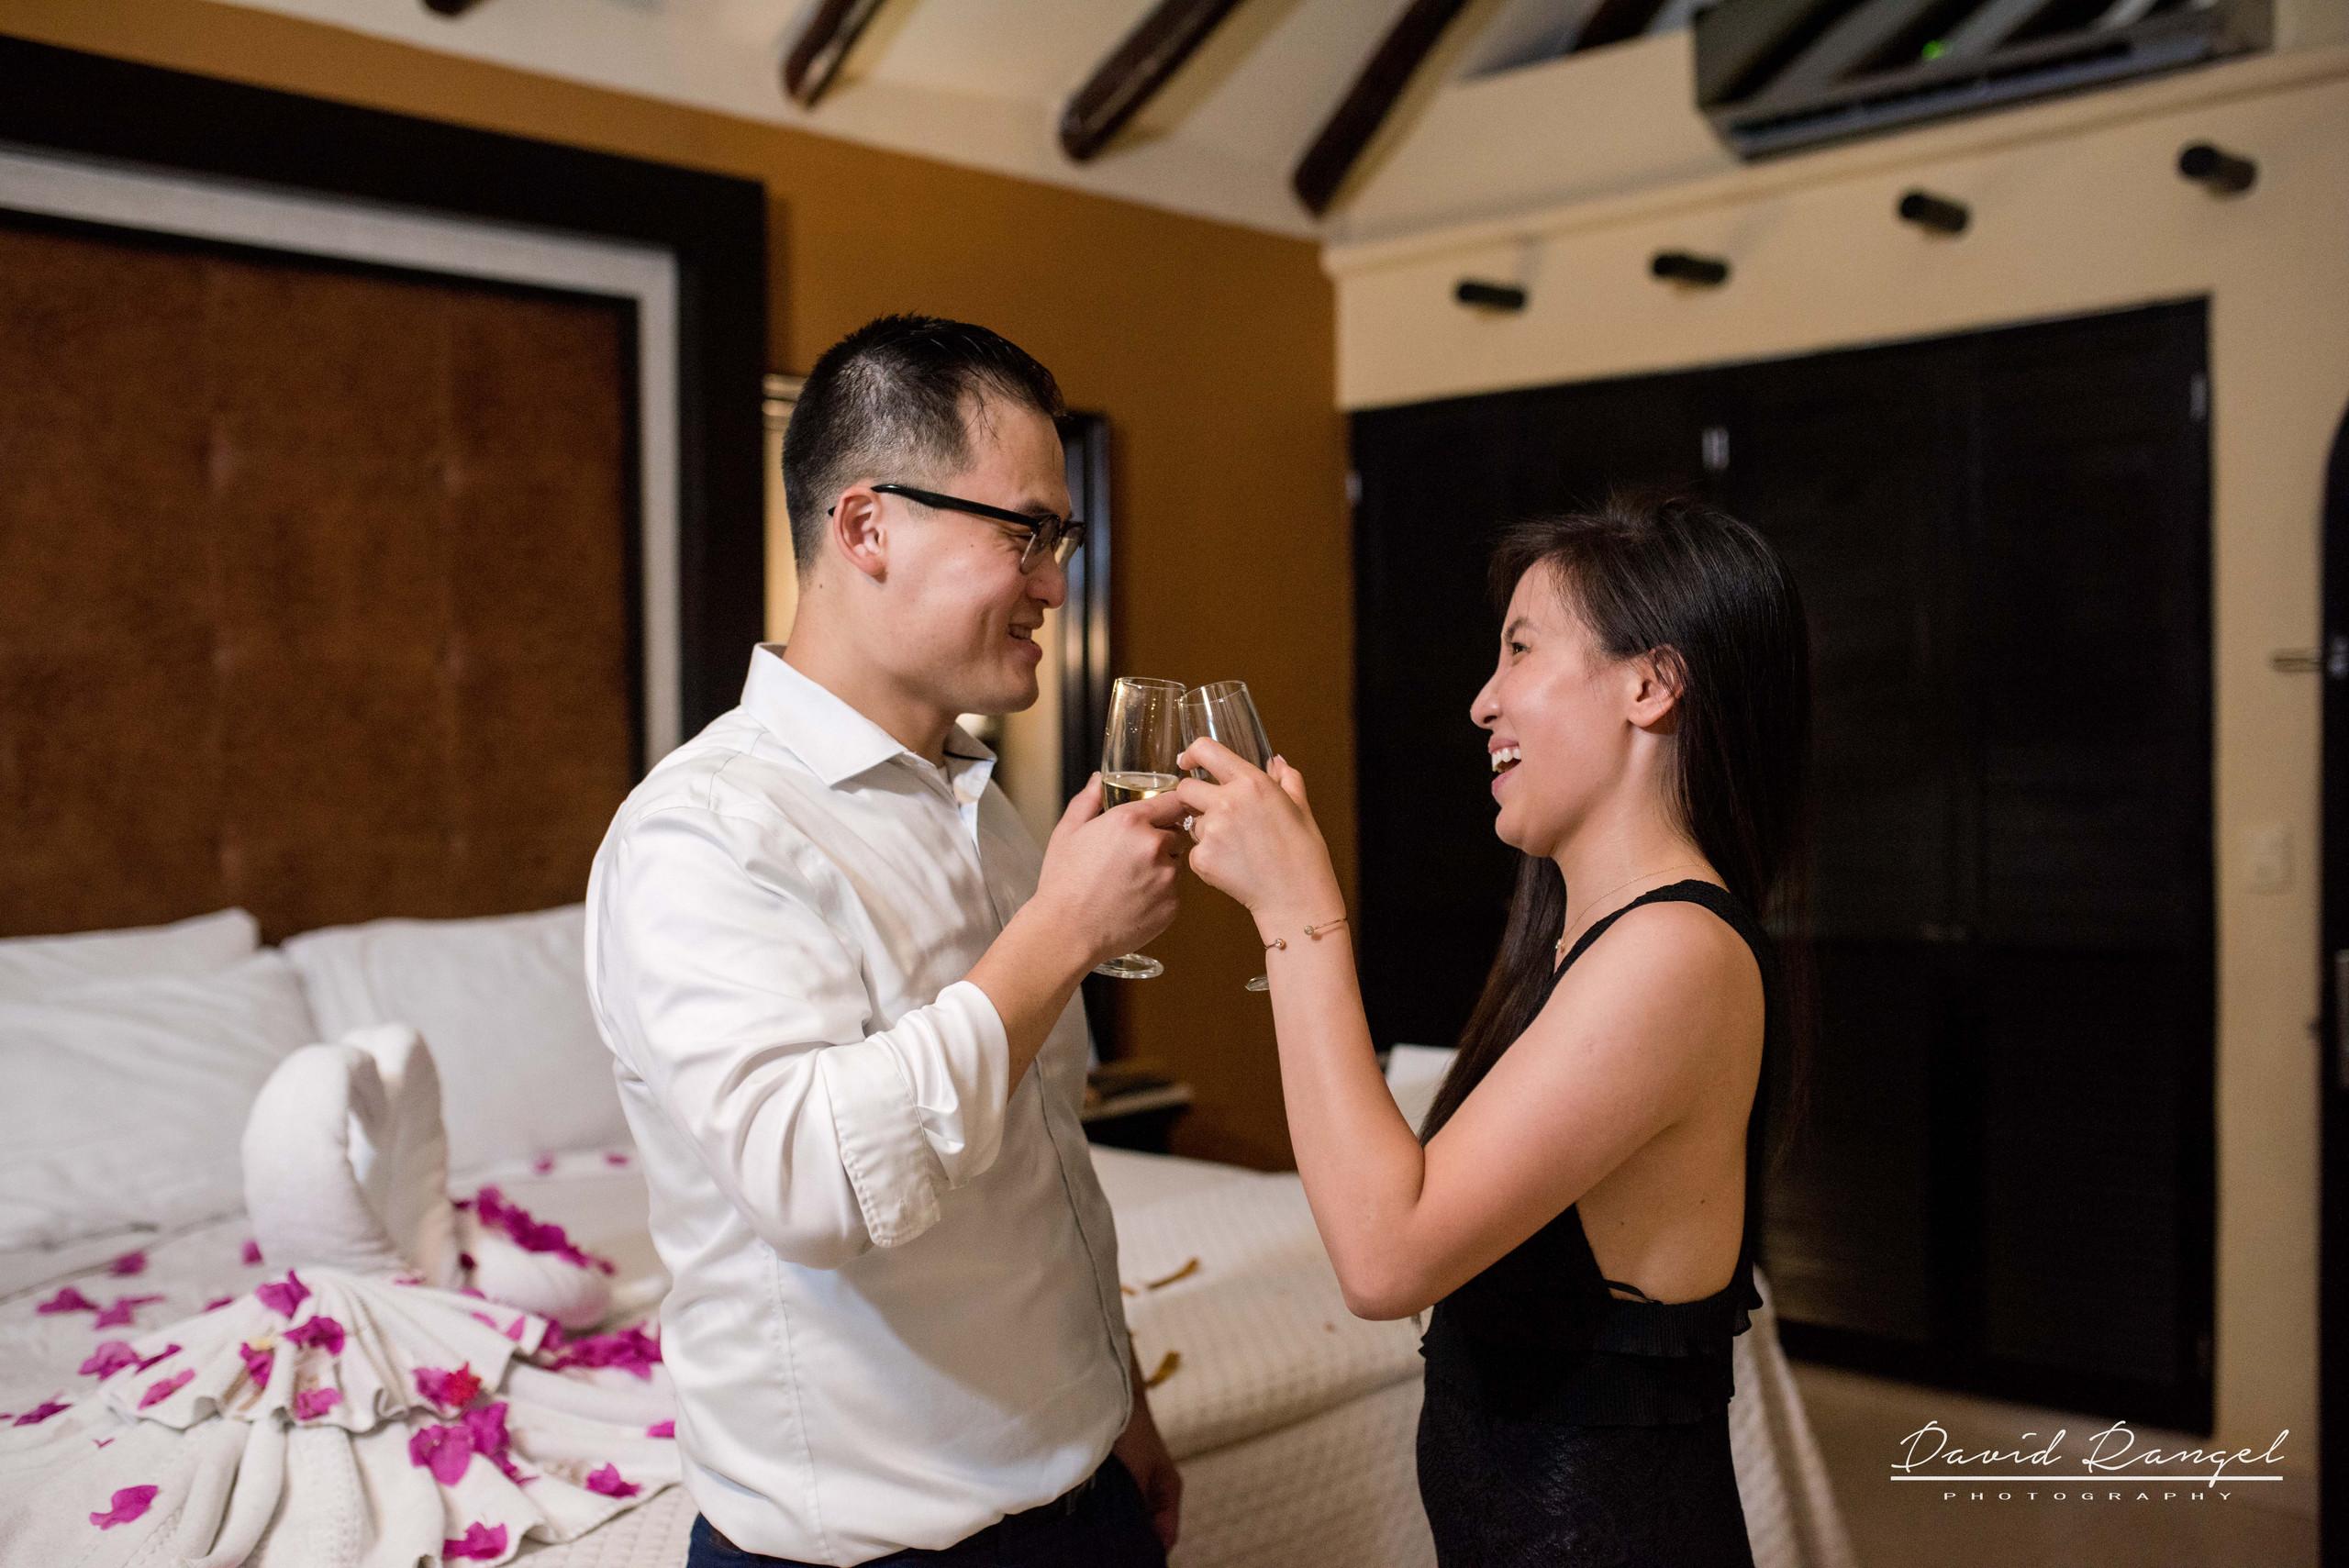 engagement+session+marriage+proposal+couple+night+photo+dorado+casitas+playa+del+carmen+photographer+destination+celebration+champagne+chears